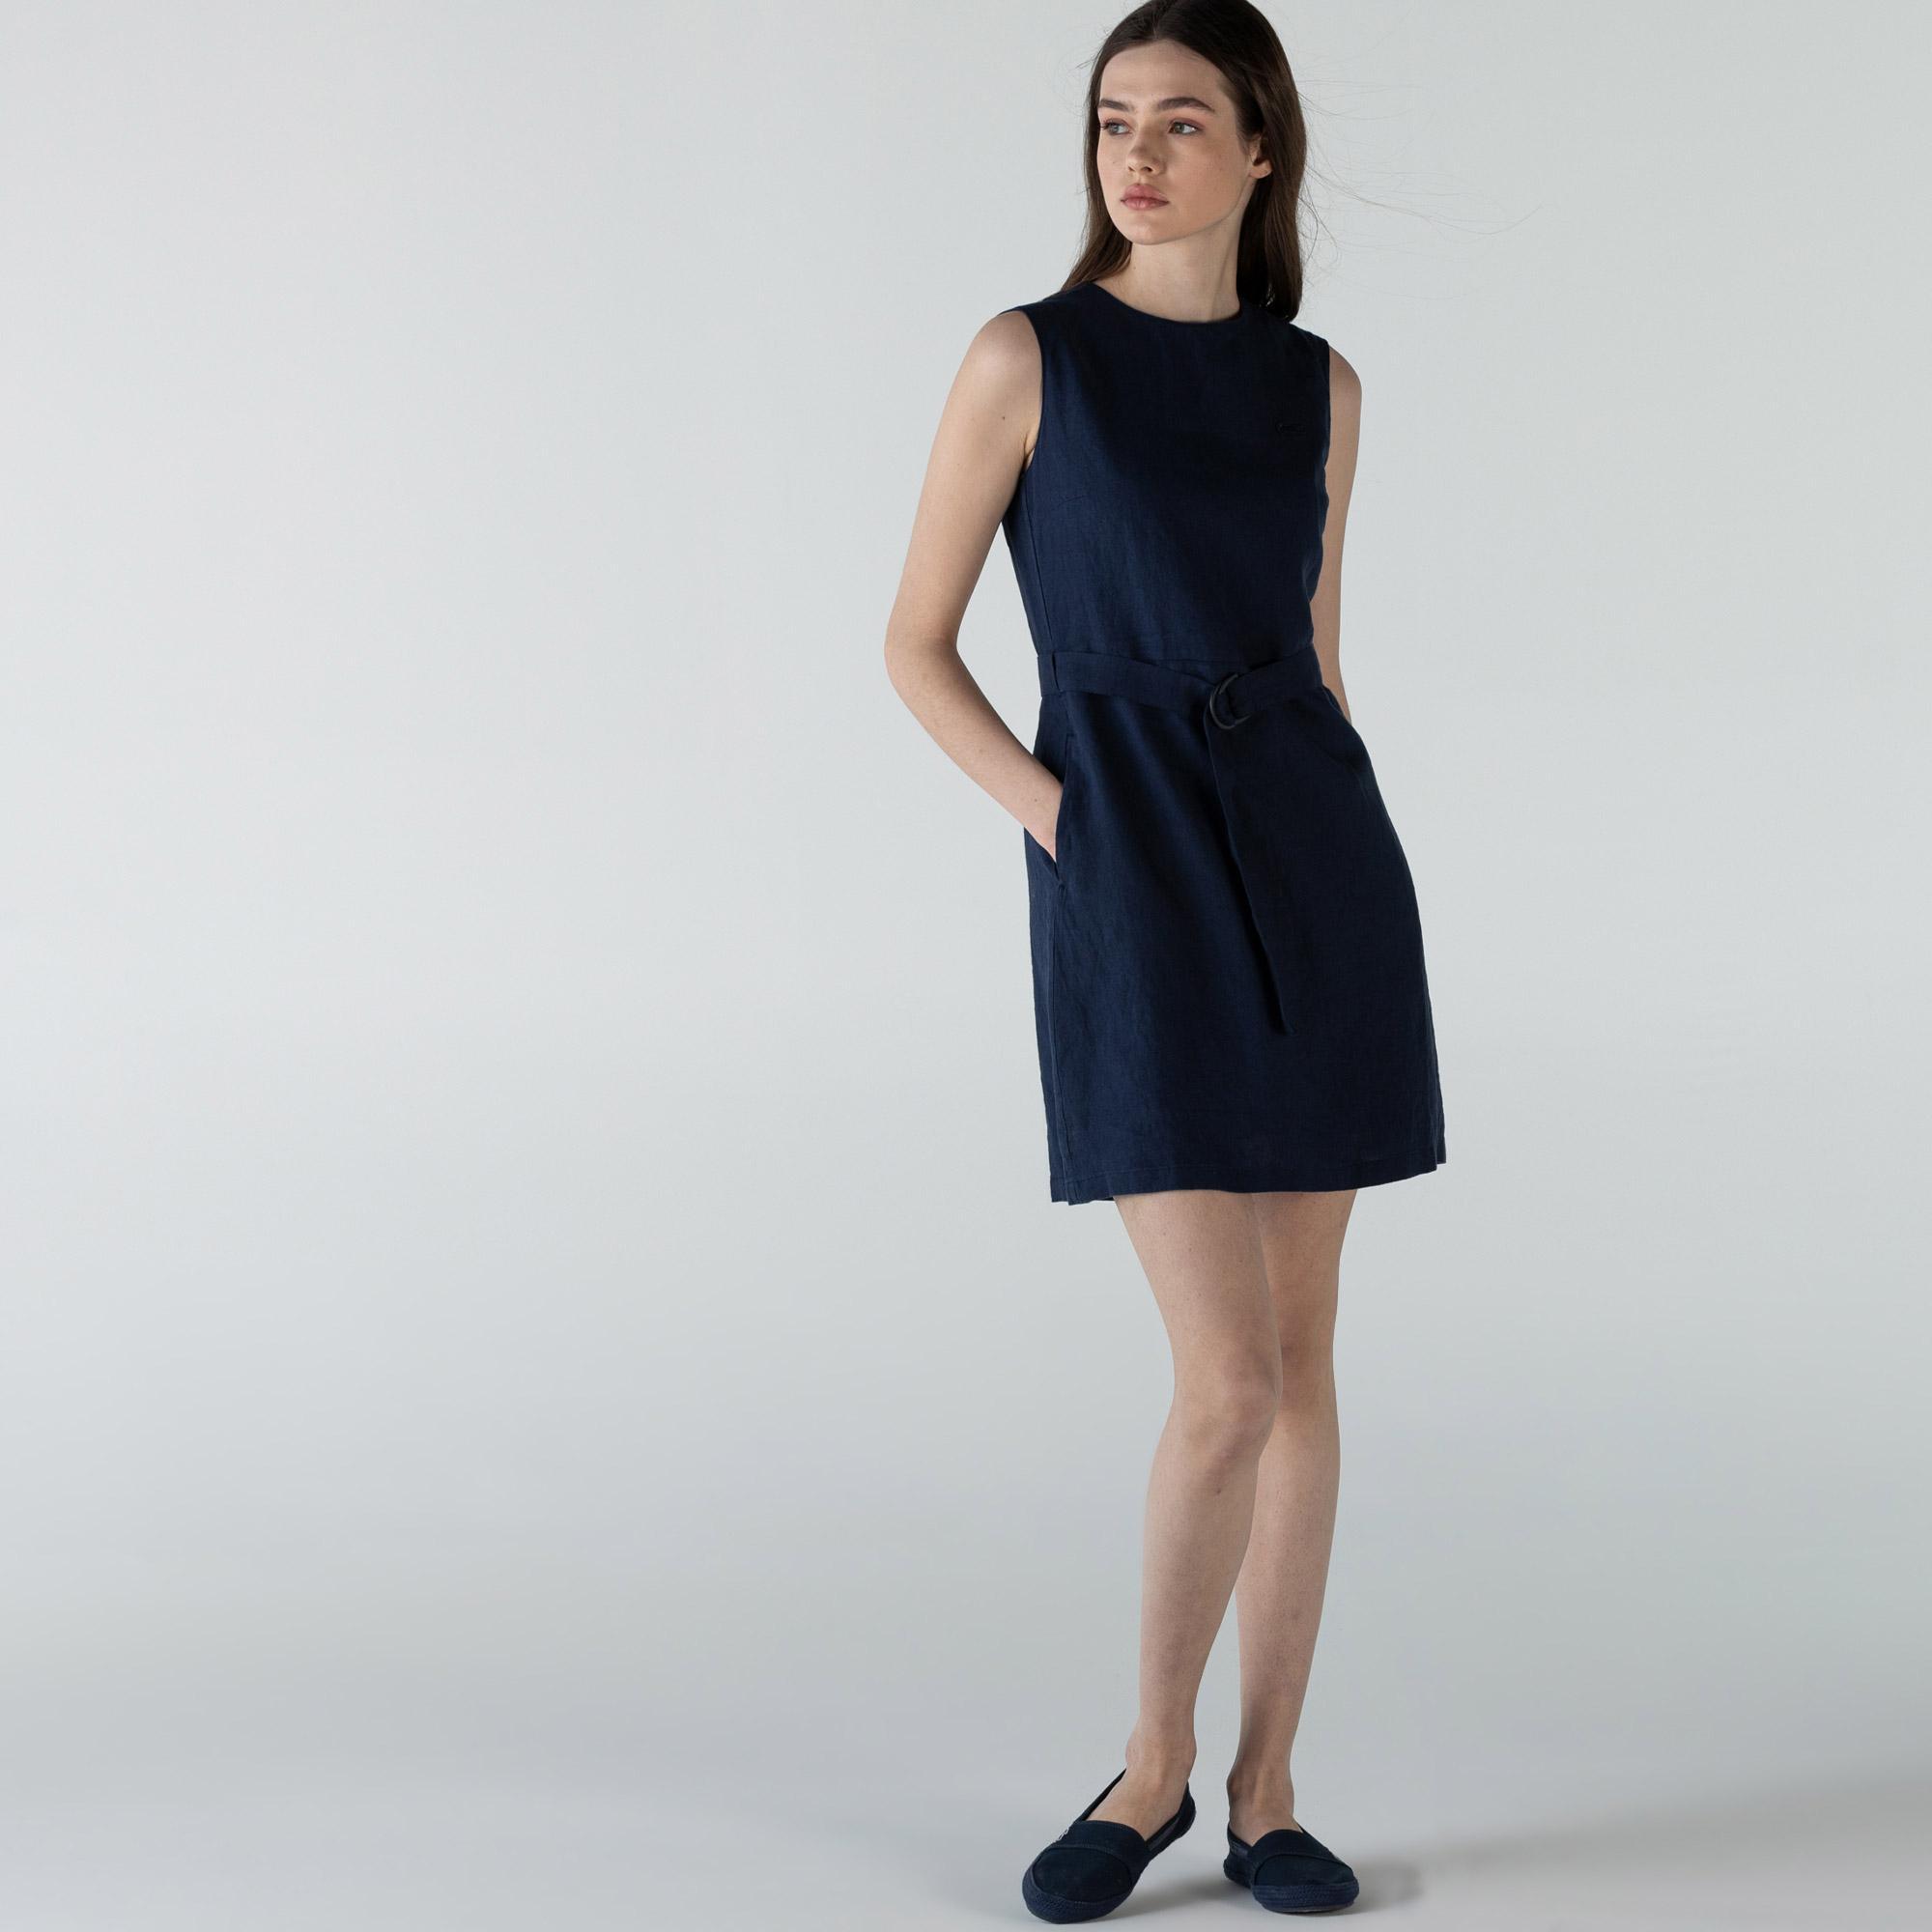 Lacoste Kadın Keten Kolsuz Bisiklet Yaka Lacivert Elbise